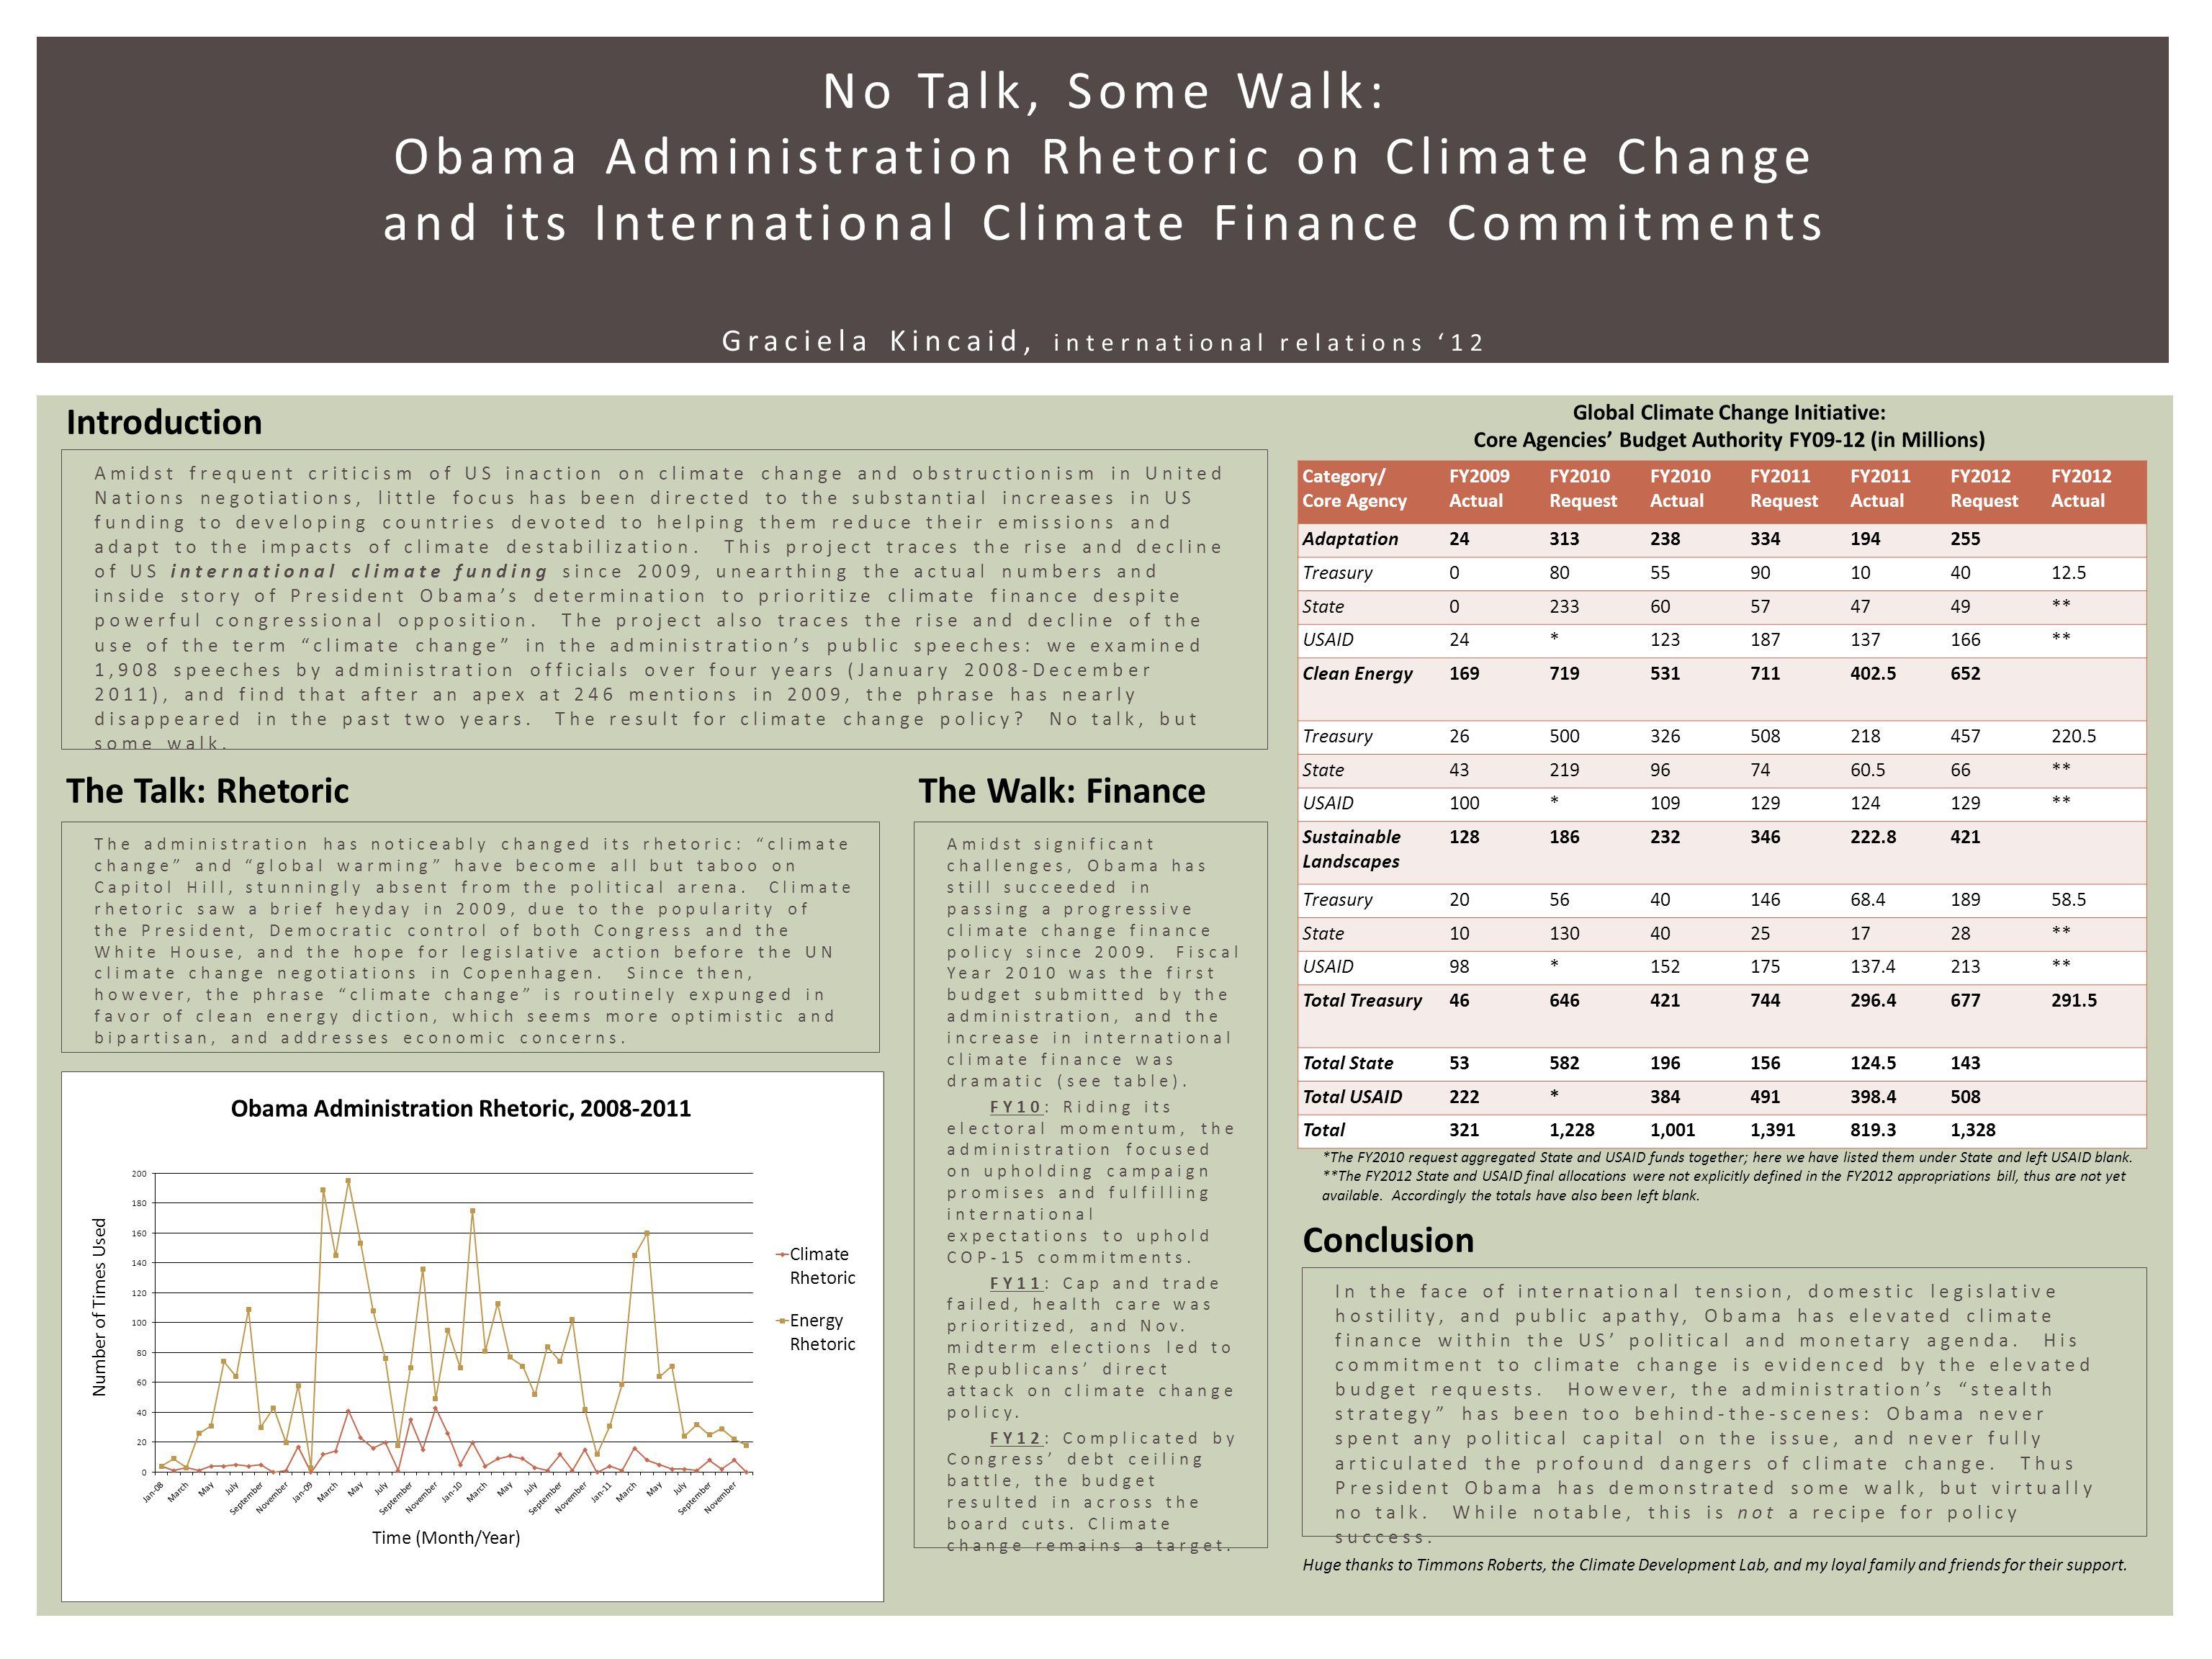 No Talk, Some Walk: Obama Administration Rhetoric on Climate Change and its International Climate Finance Commitments Graciela Kincaid, international